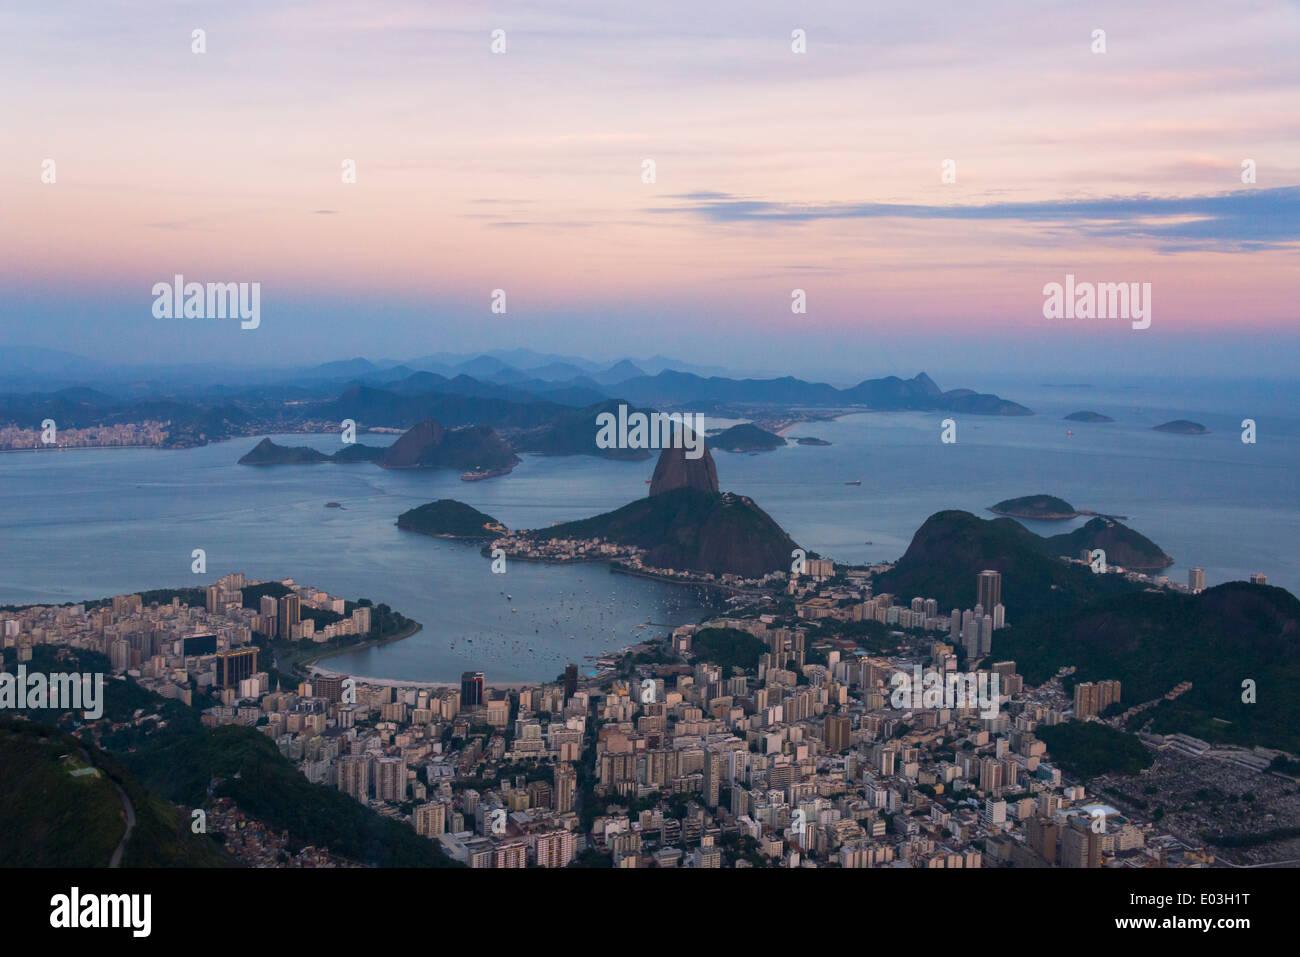 Sugarloaf Mountain and cityscape in Botafogo Bay, Rio de Janeiro, Brazil - Stock Image